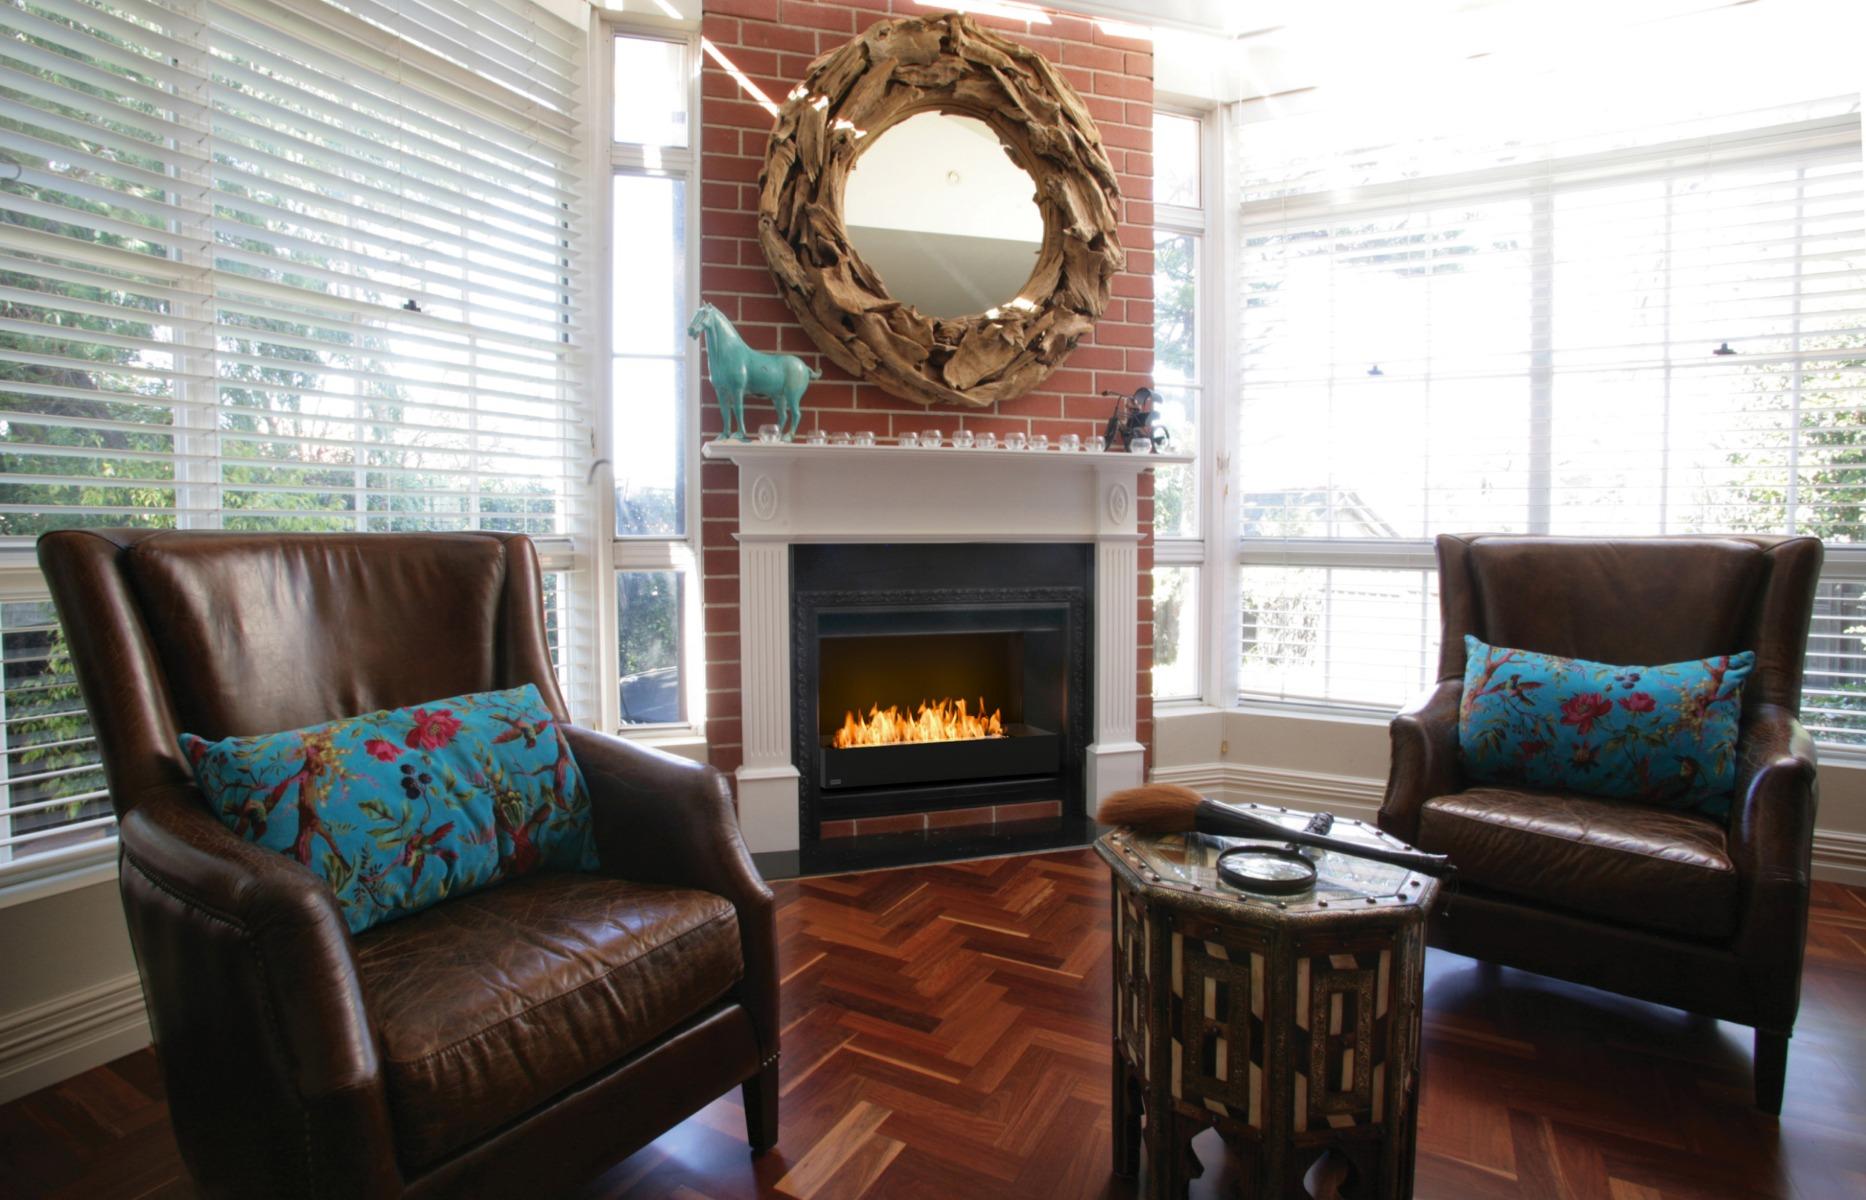 EcoSmart Fire Fireplace Grate 36